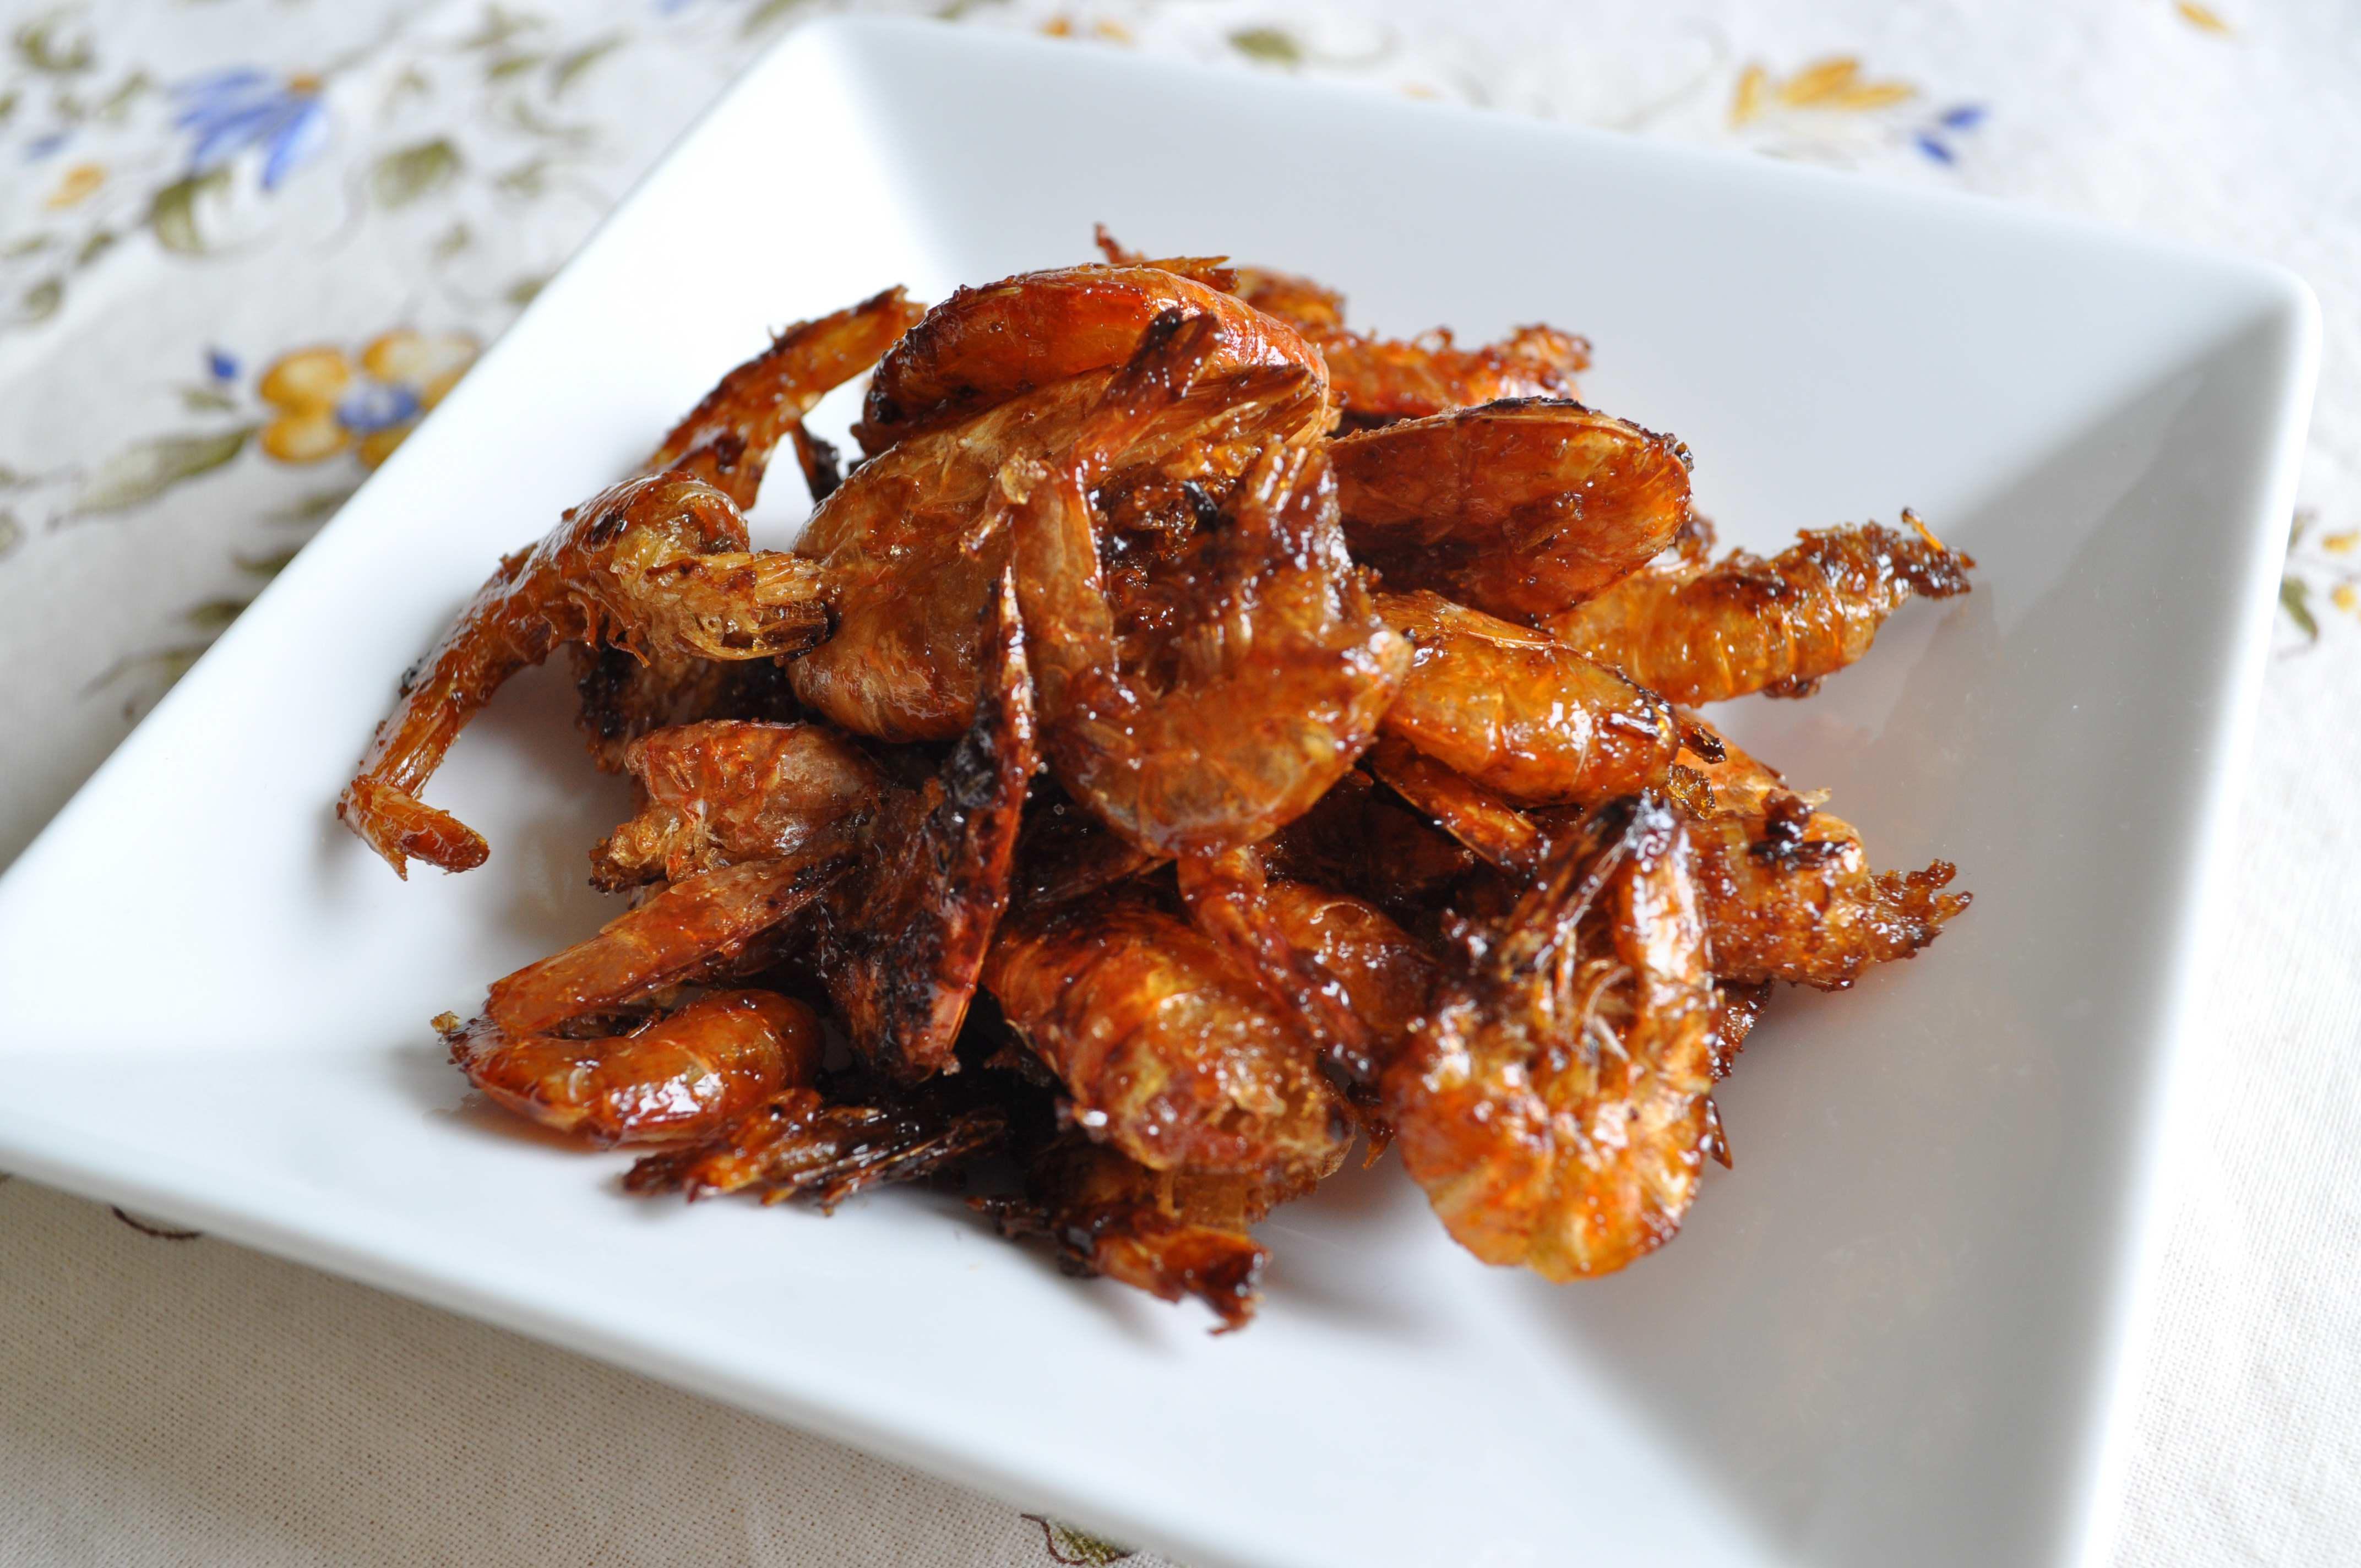 Korean Sauteed Dried Shrimp